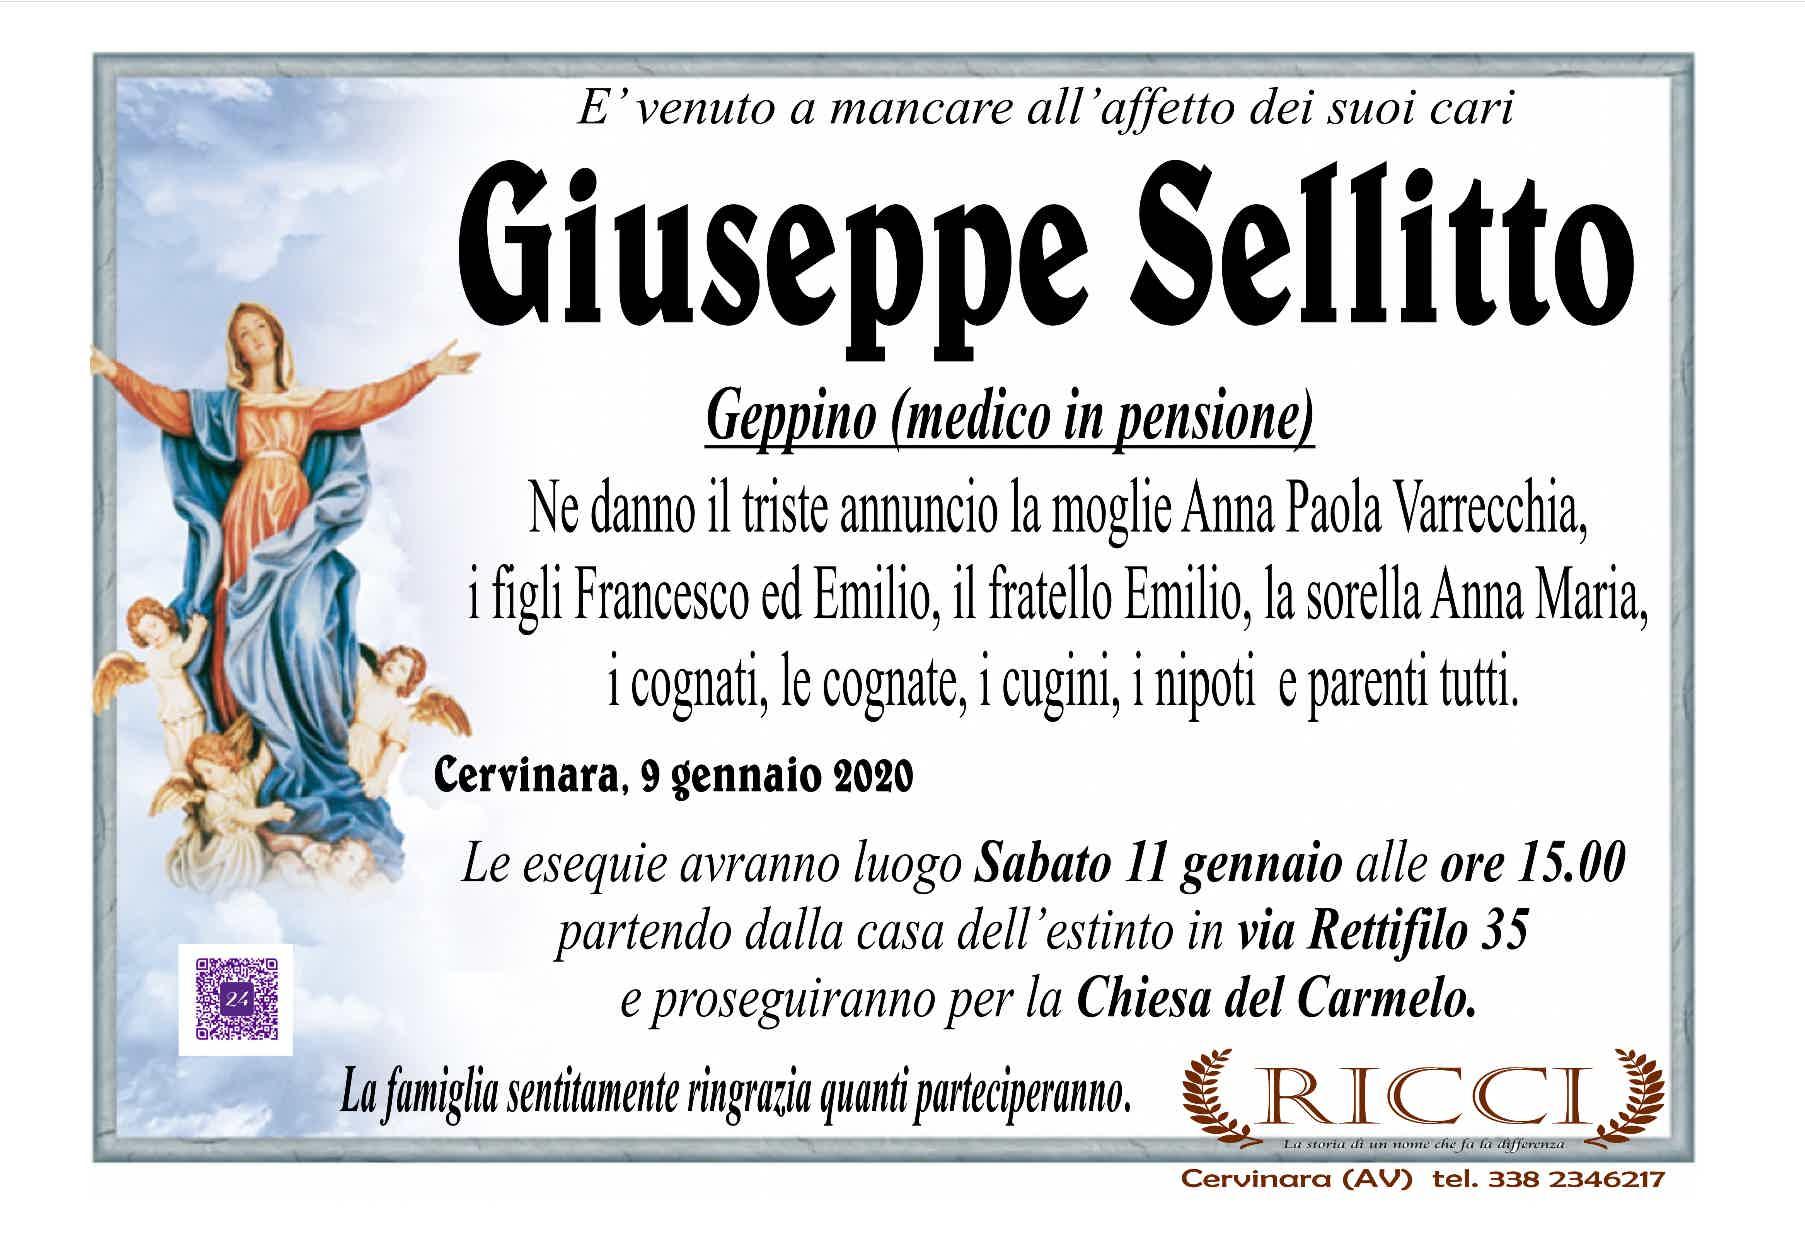 Giuseppe Sellitto